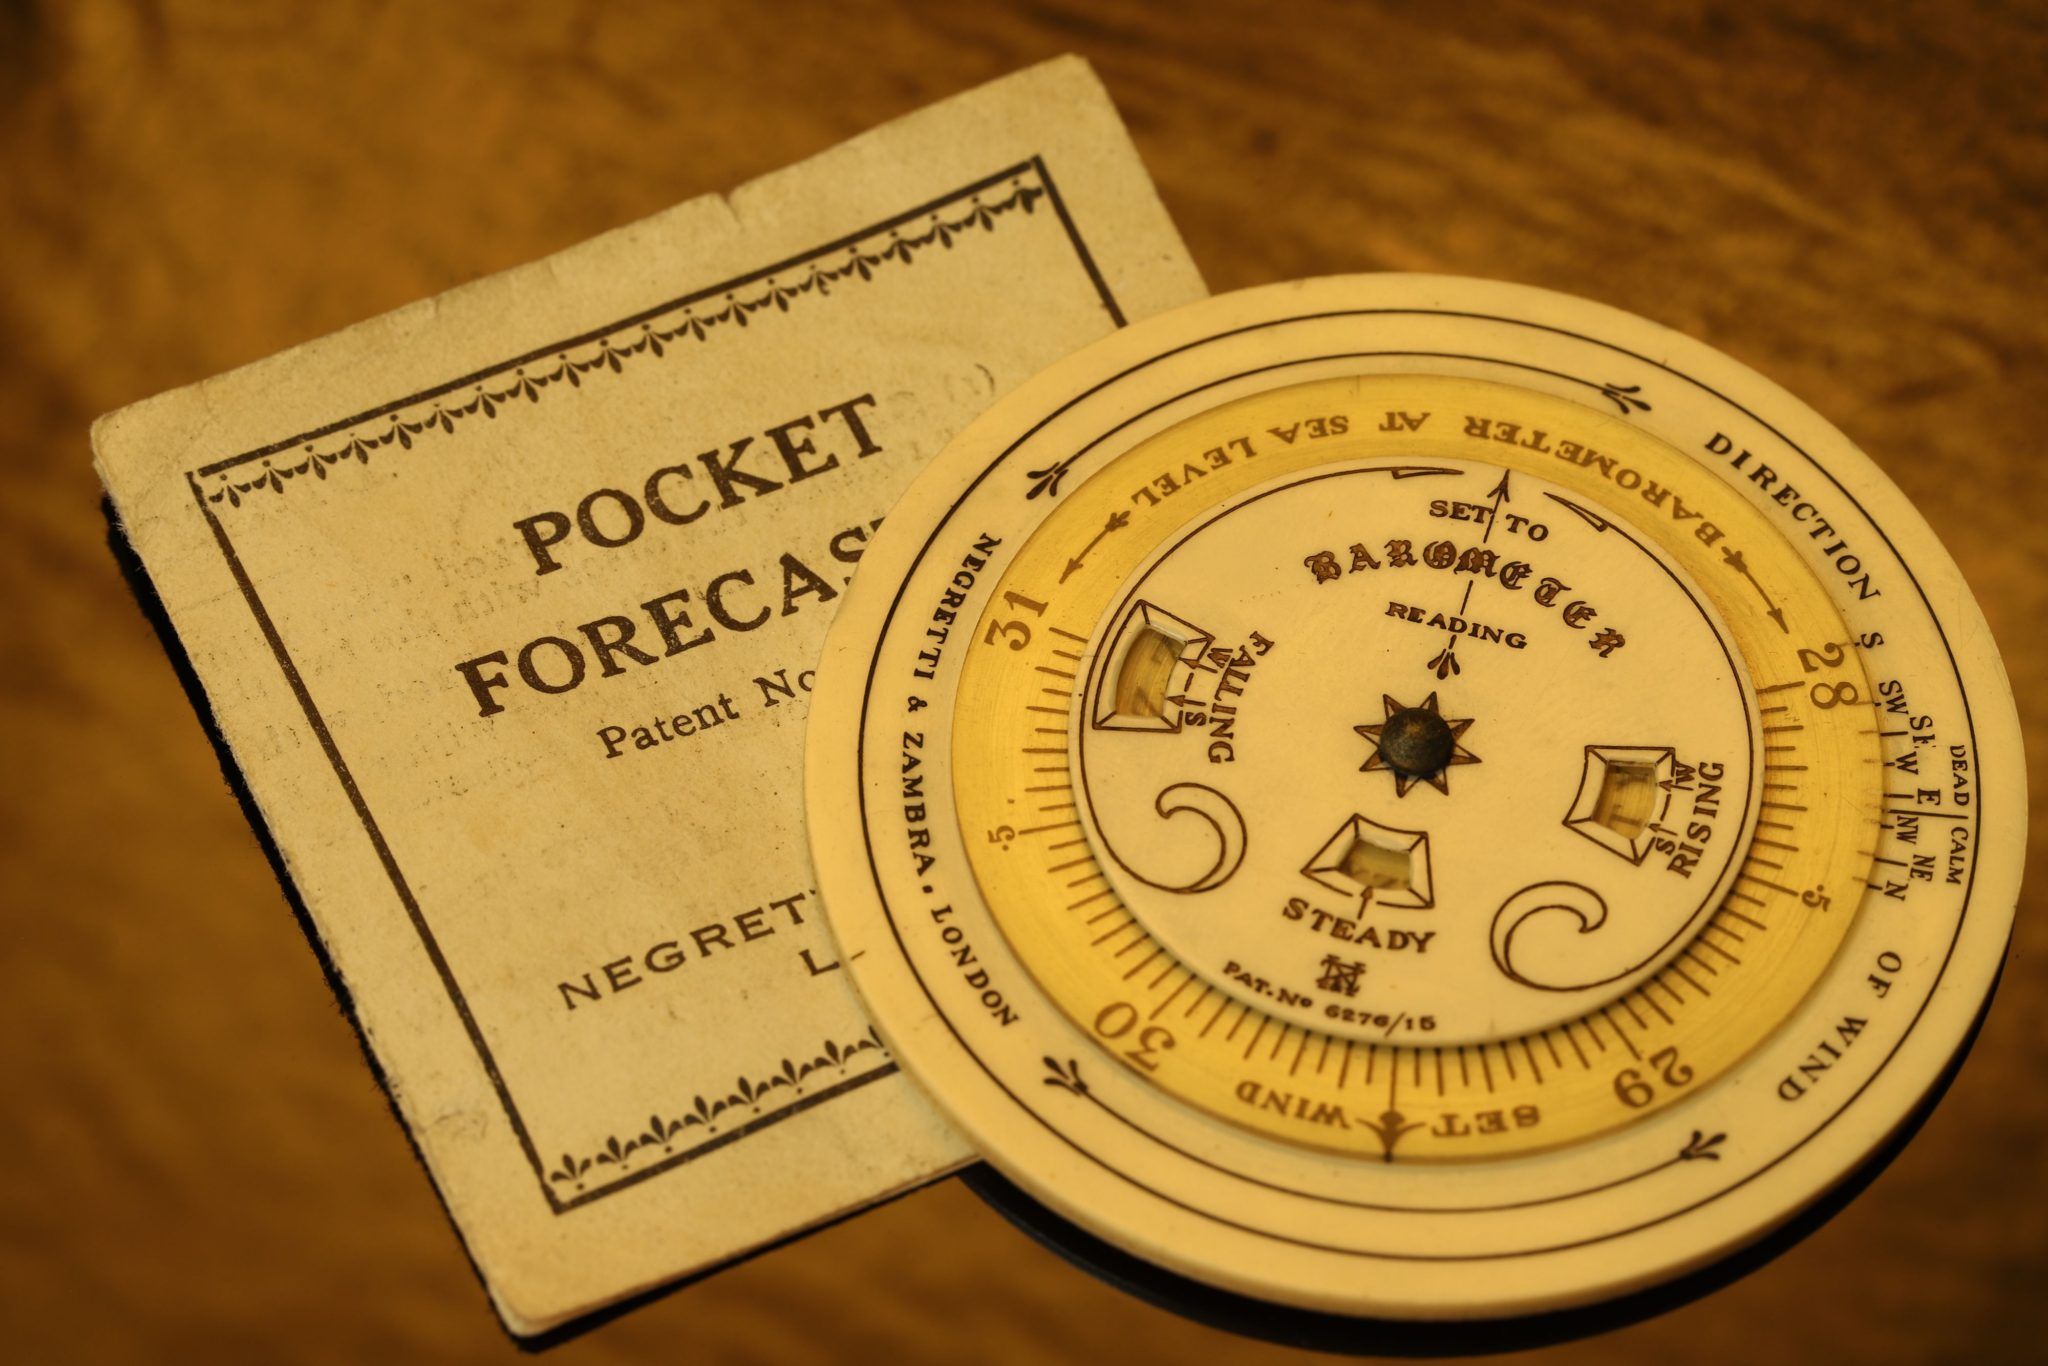 Image of Negretti & Zambra Pocket Forecaster c1925